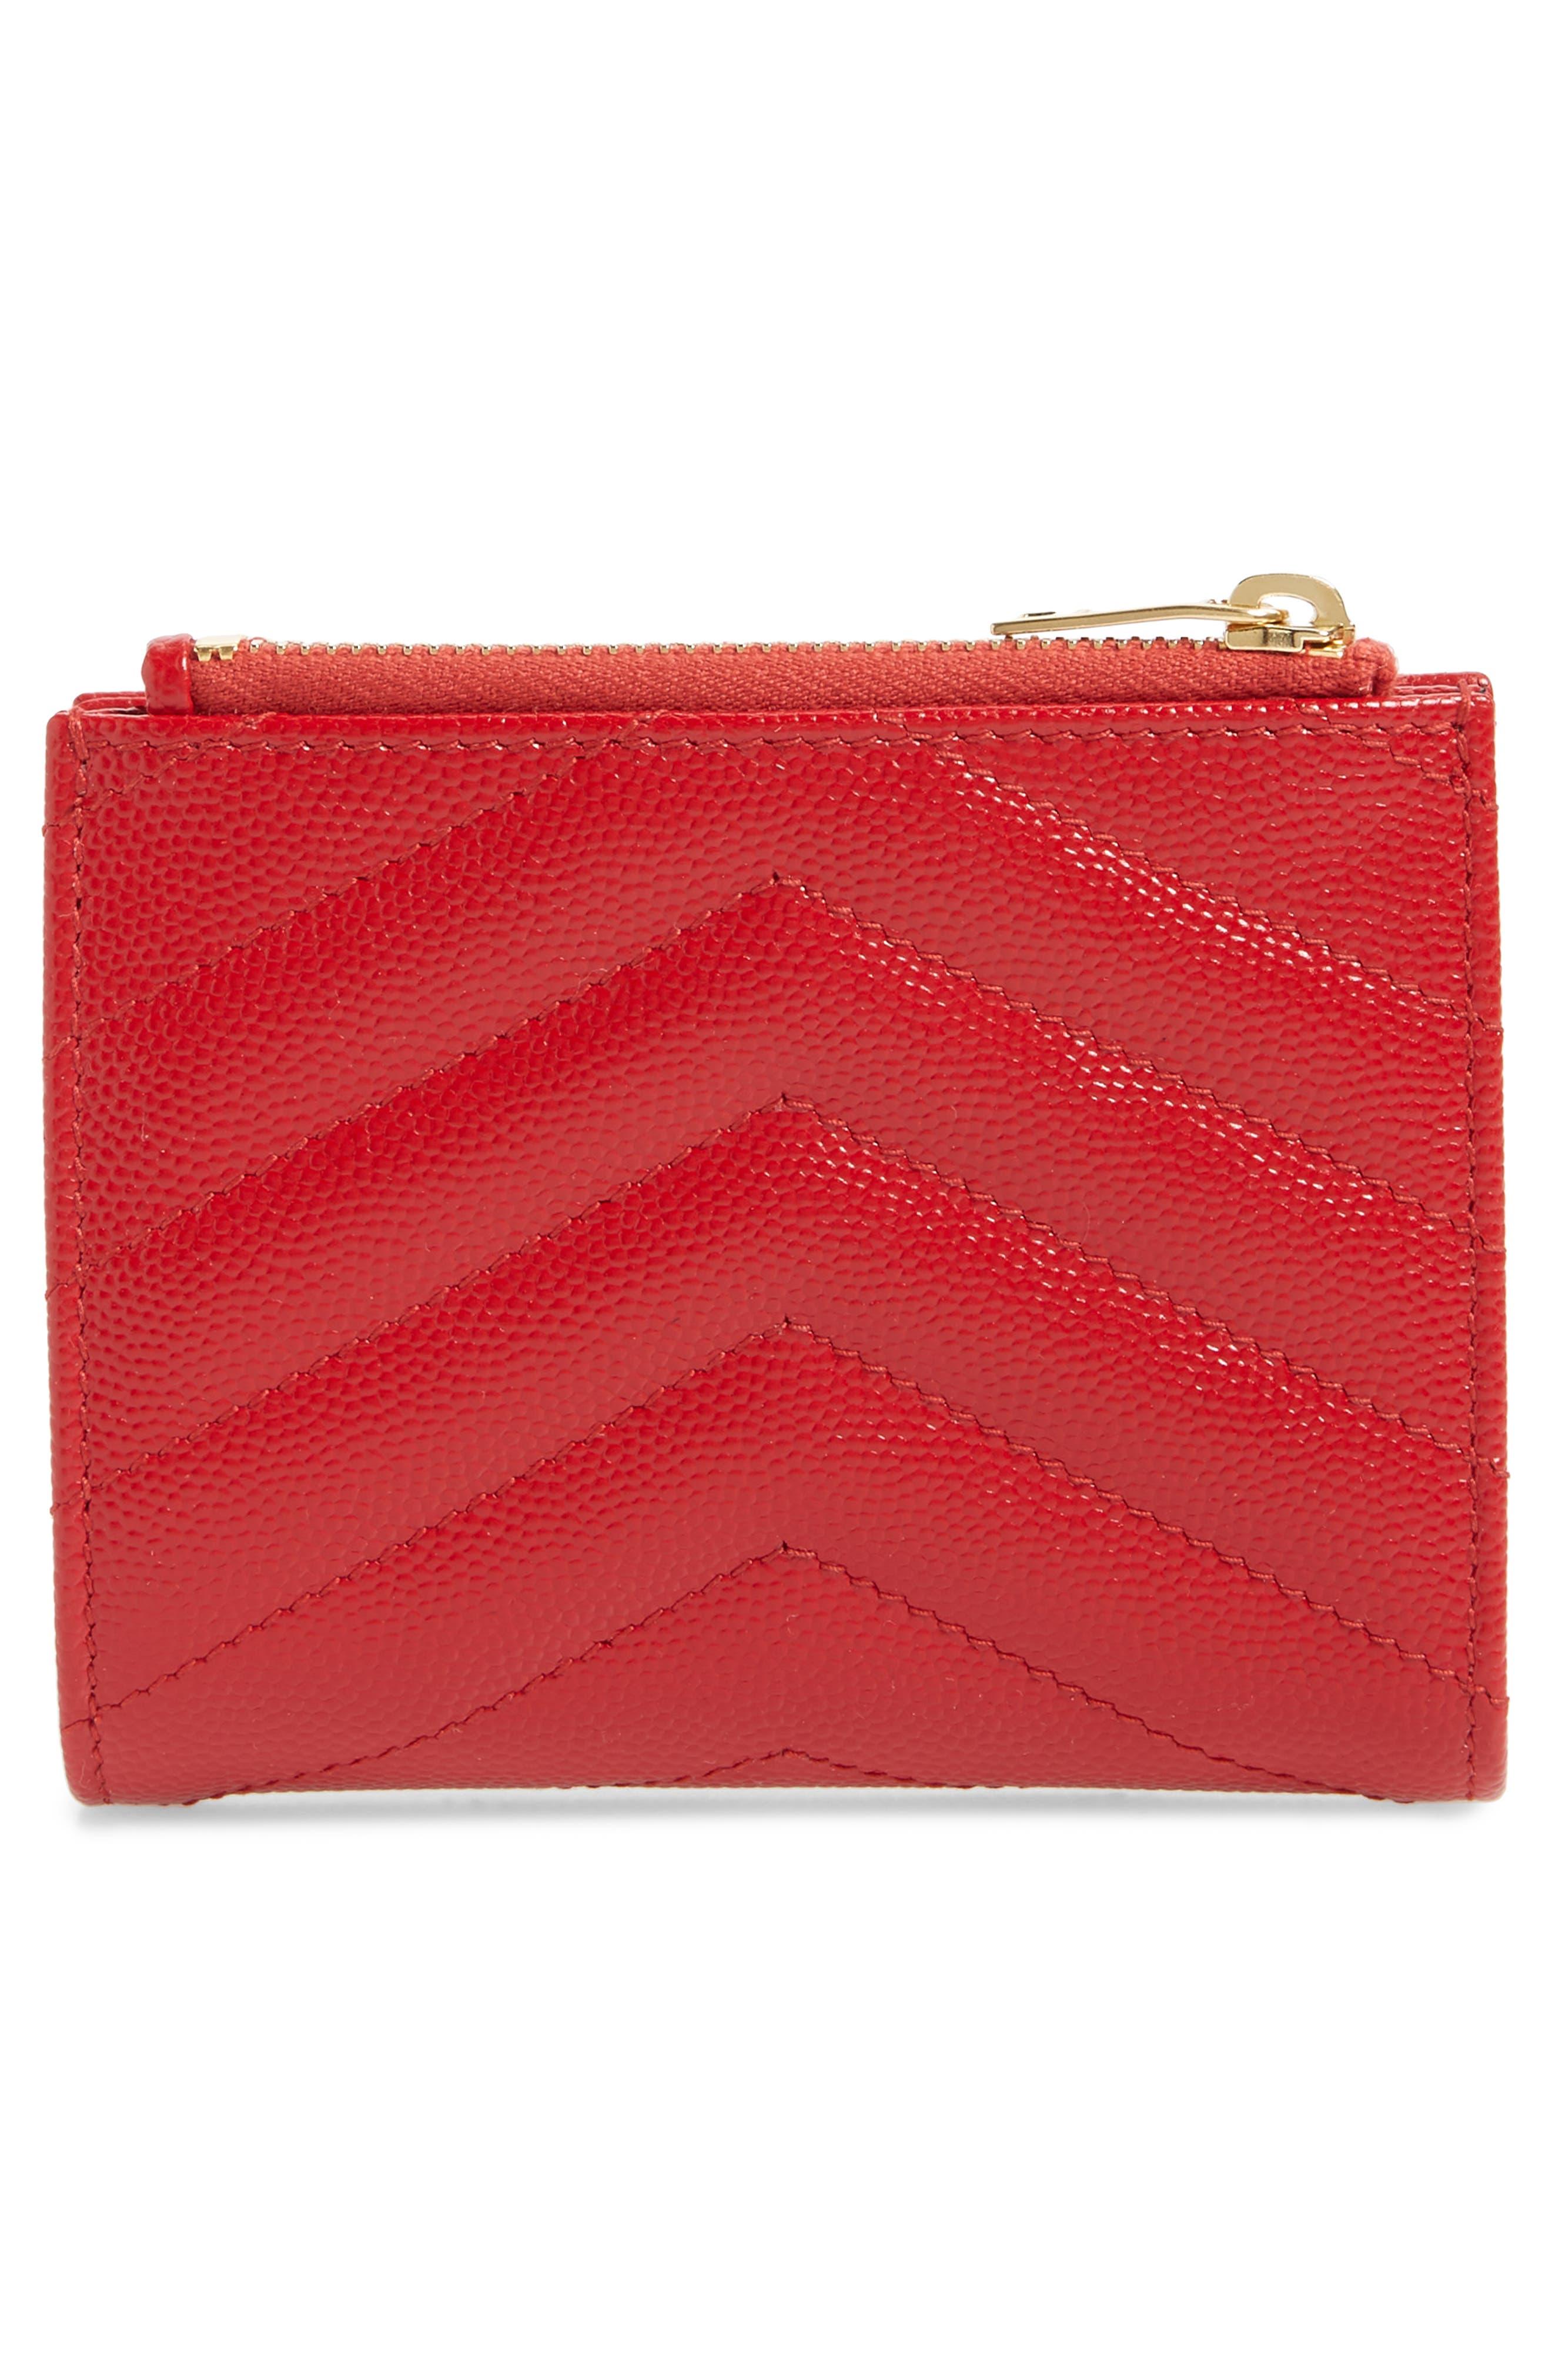 Monogram Leather Card Case,                             Alternate thumbnail 4, color,                             BANDANA RED